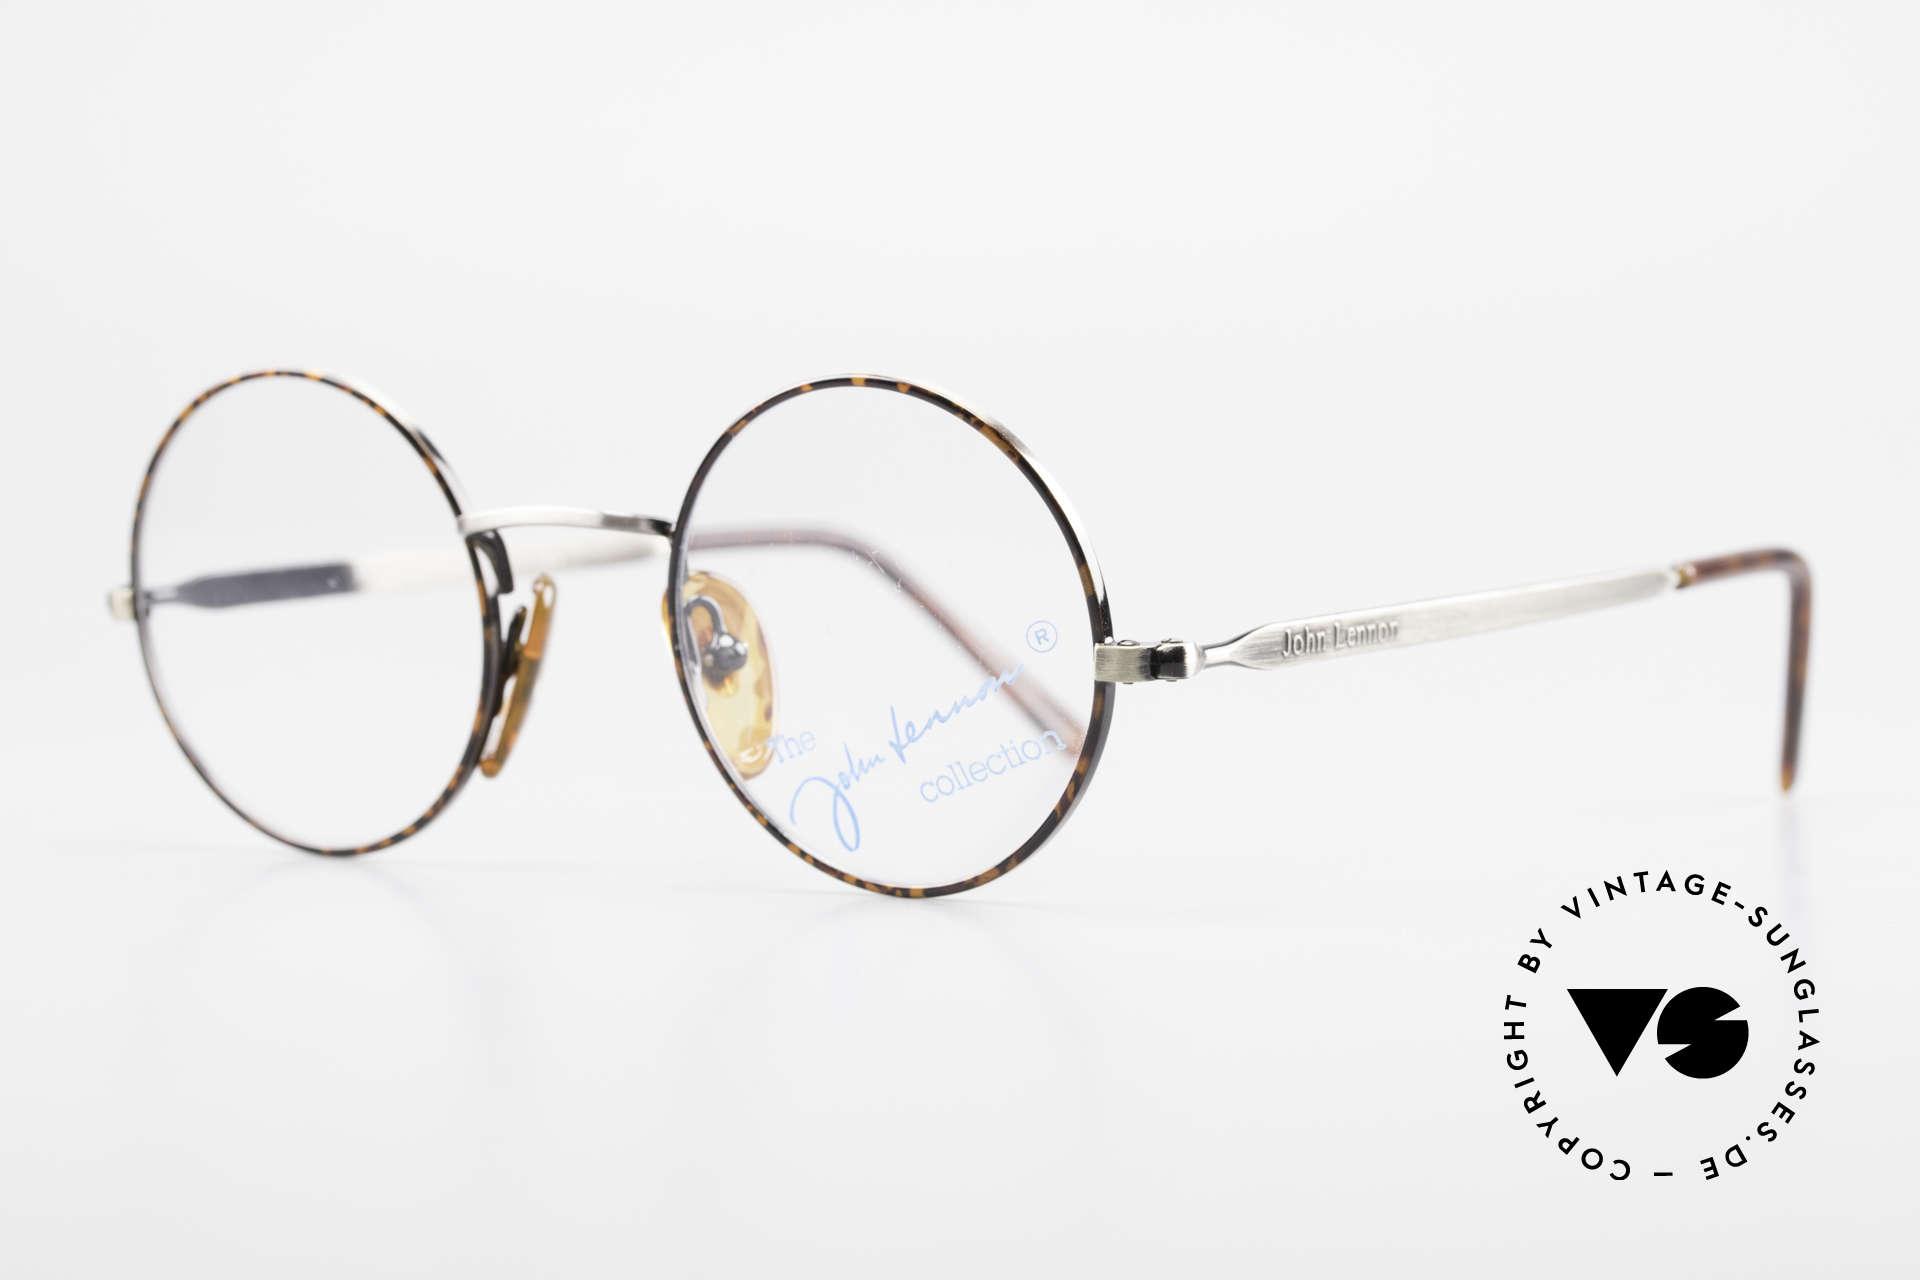 John Lennon - Revolution Small Round Vintage Glasses, SMALL round eyeglasses (with interesting finish), Made for Men and Women